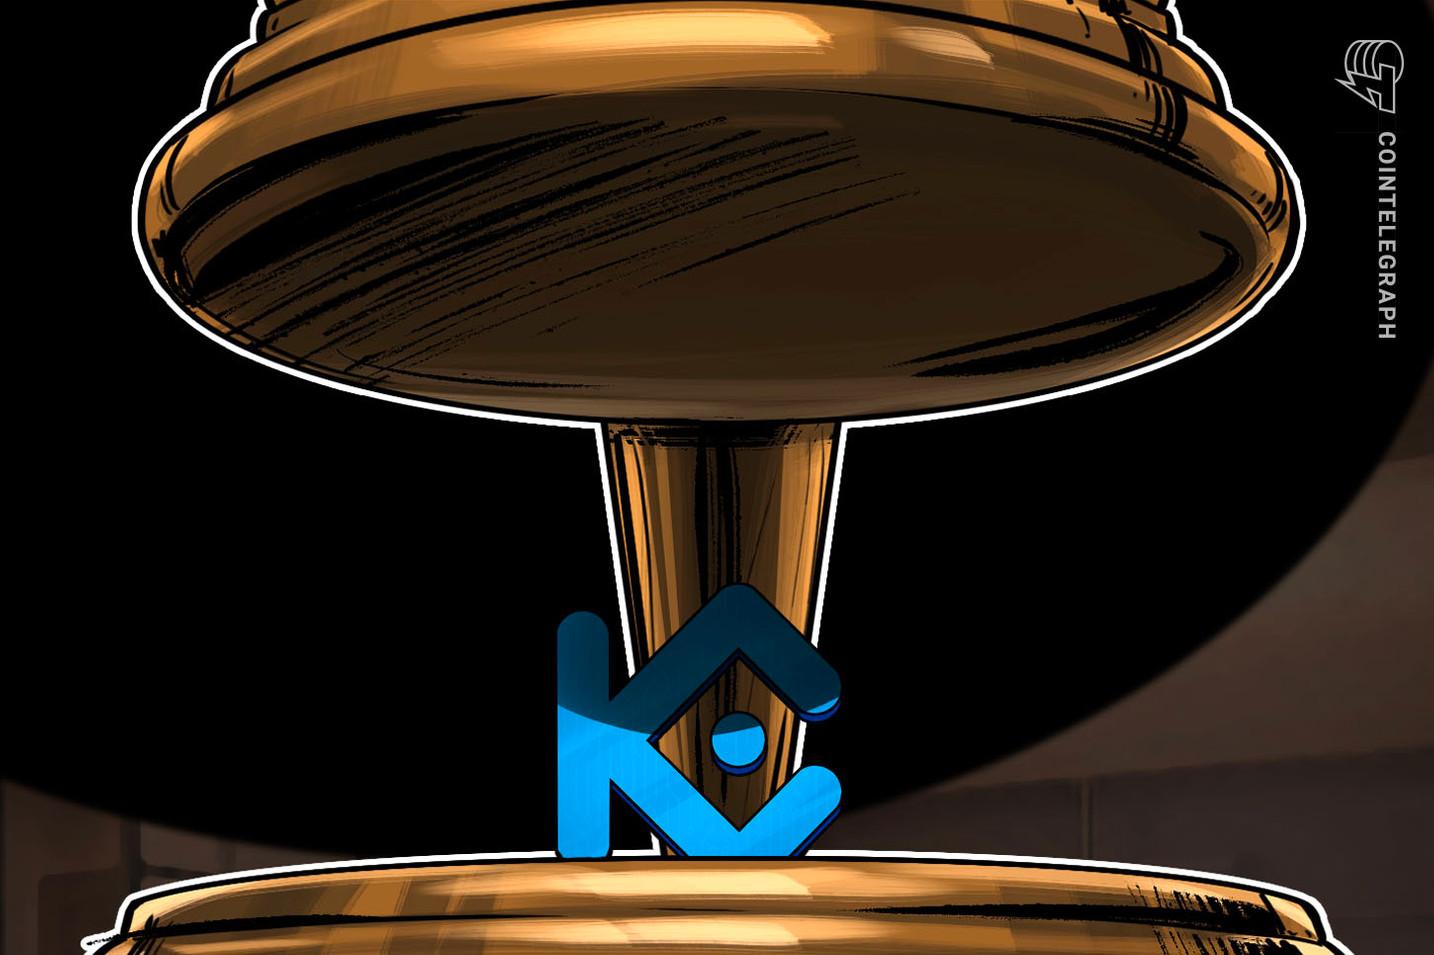 El regulador de valores de Ontario toma medidas contra Kucoin